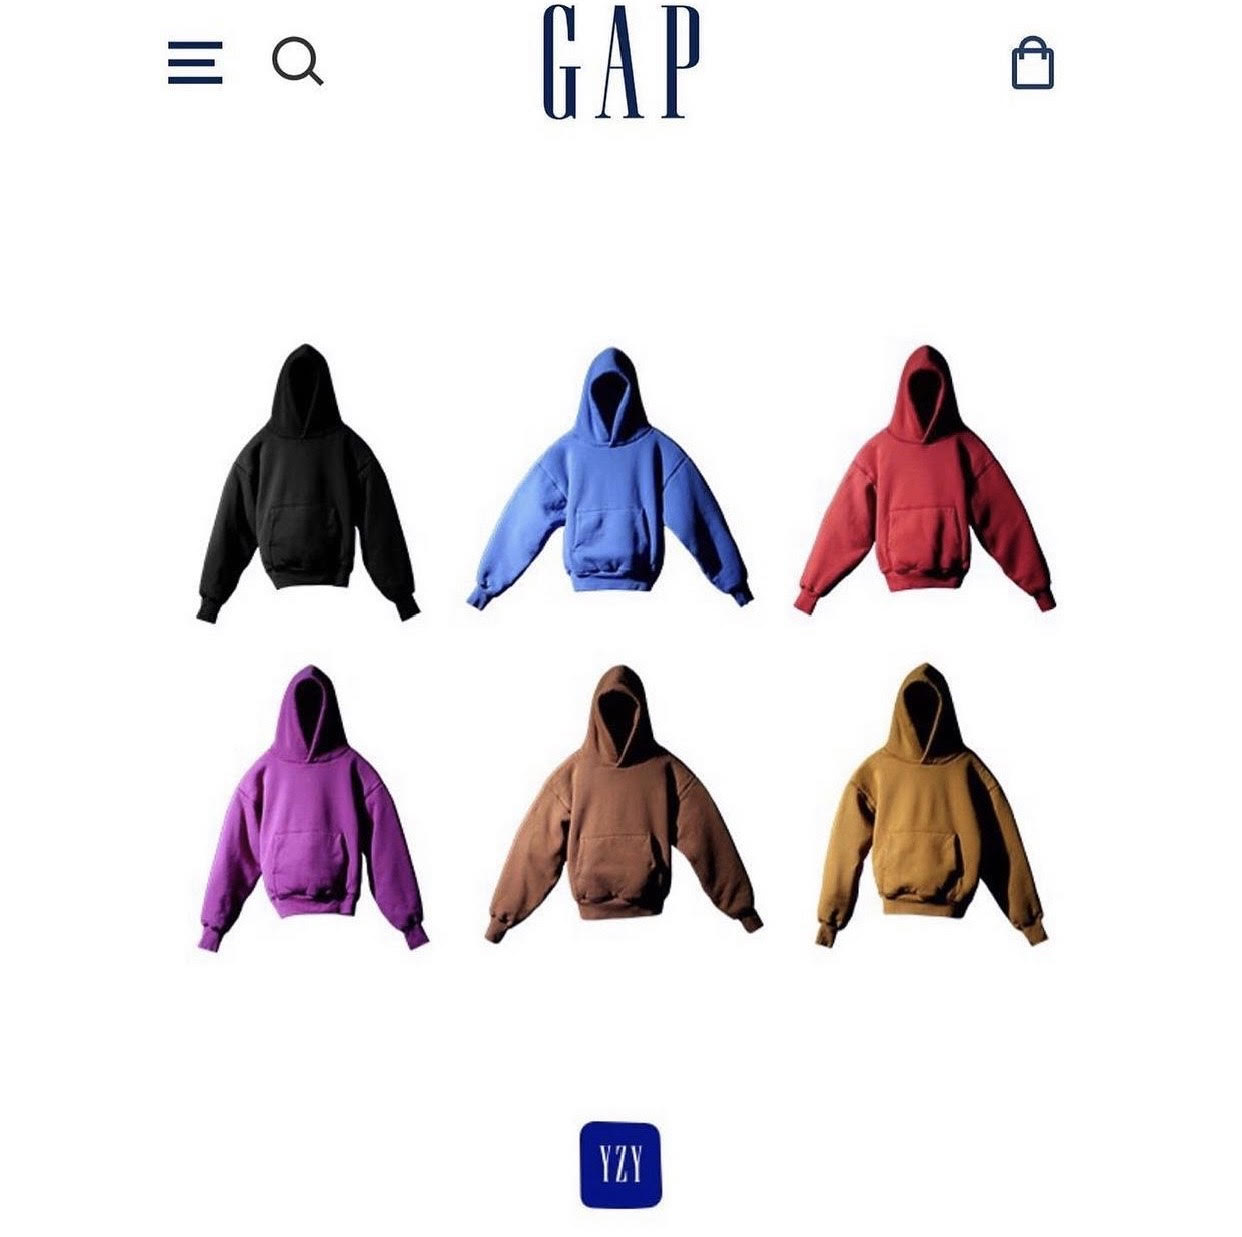 Yeezy x Gap